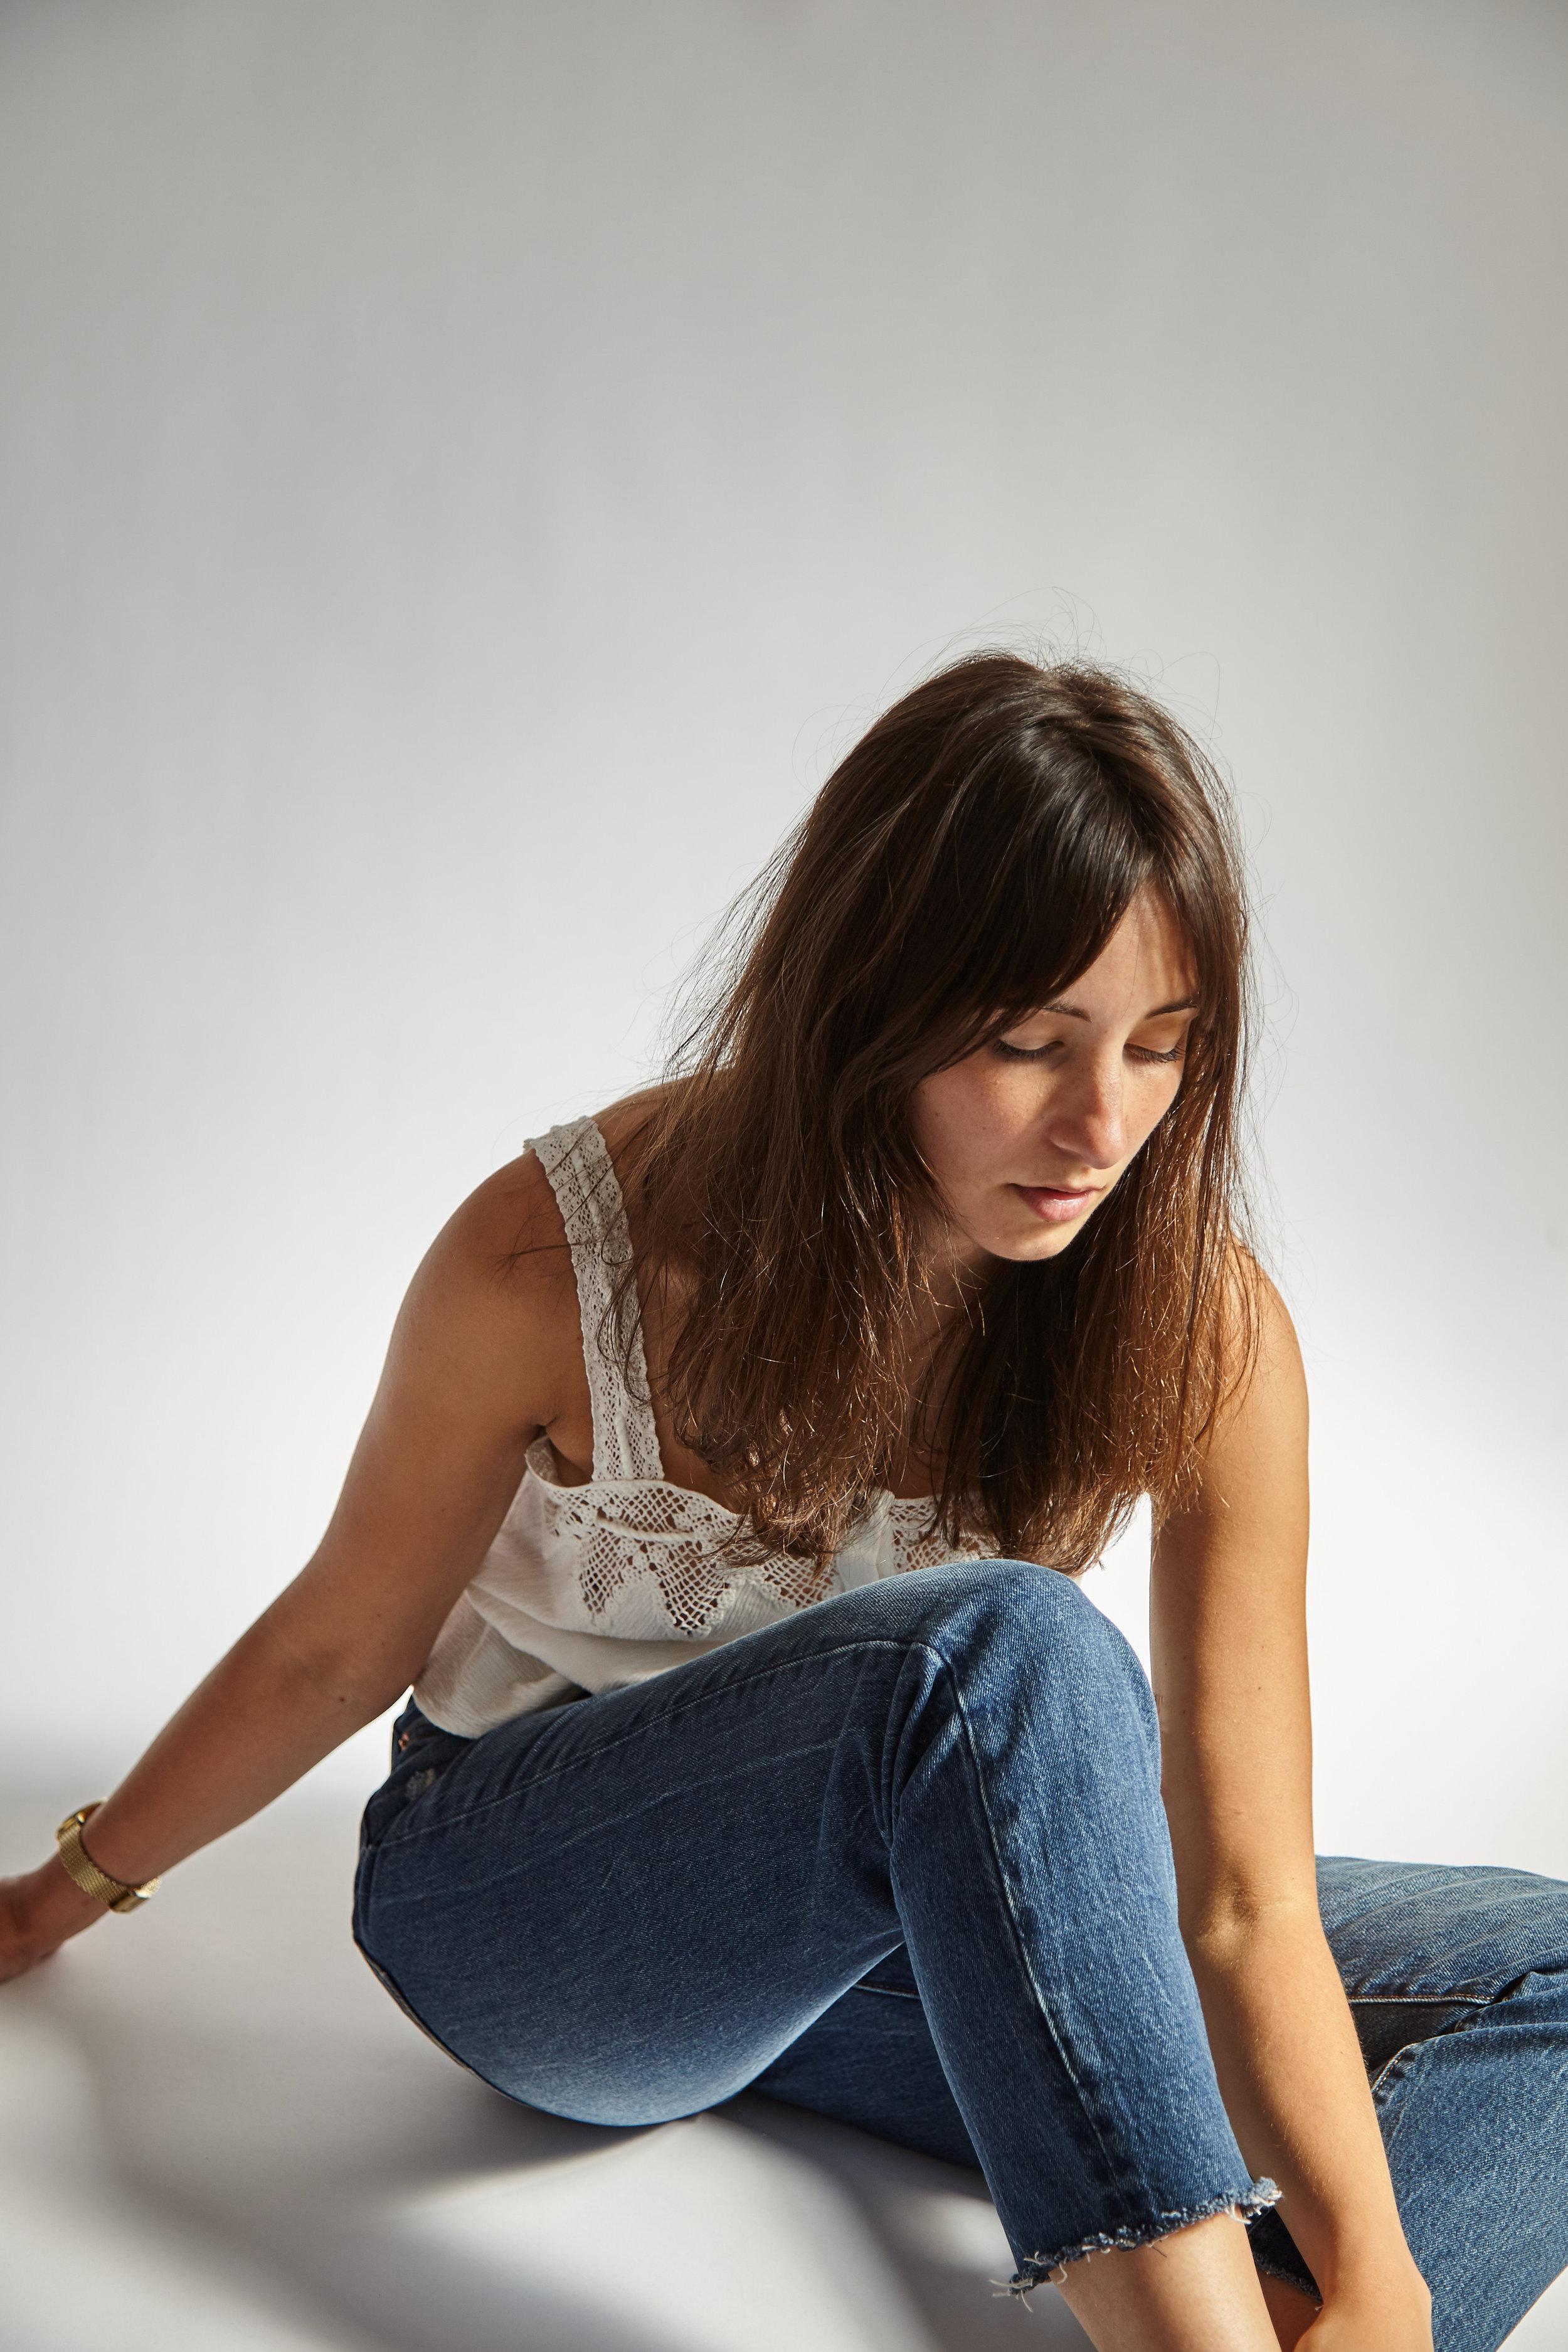 rosie_butcher_wearing_levis_jeans.jpg